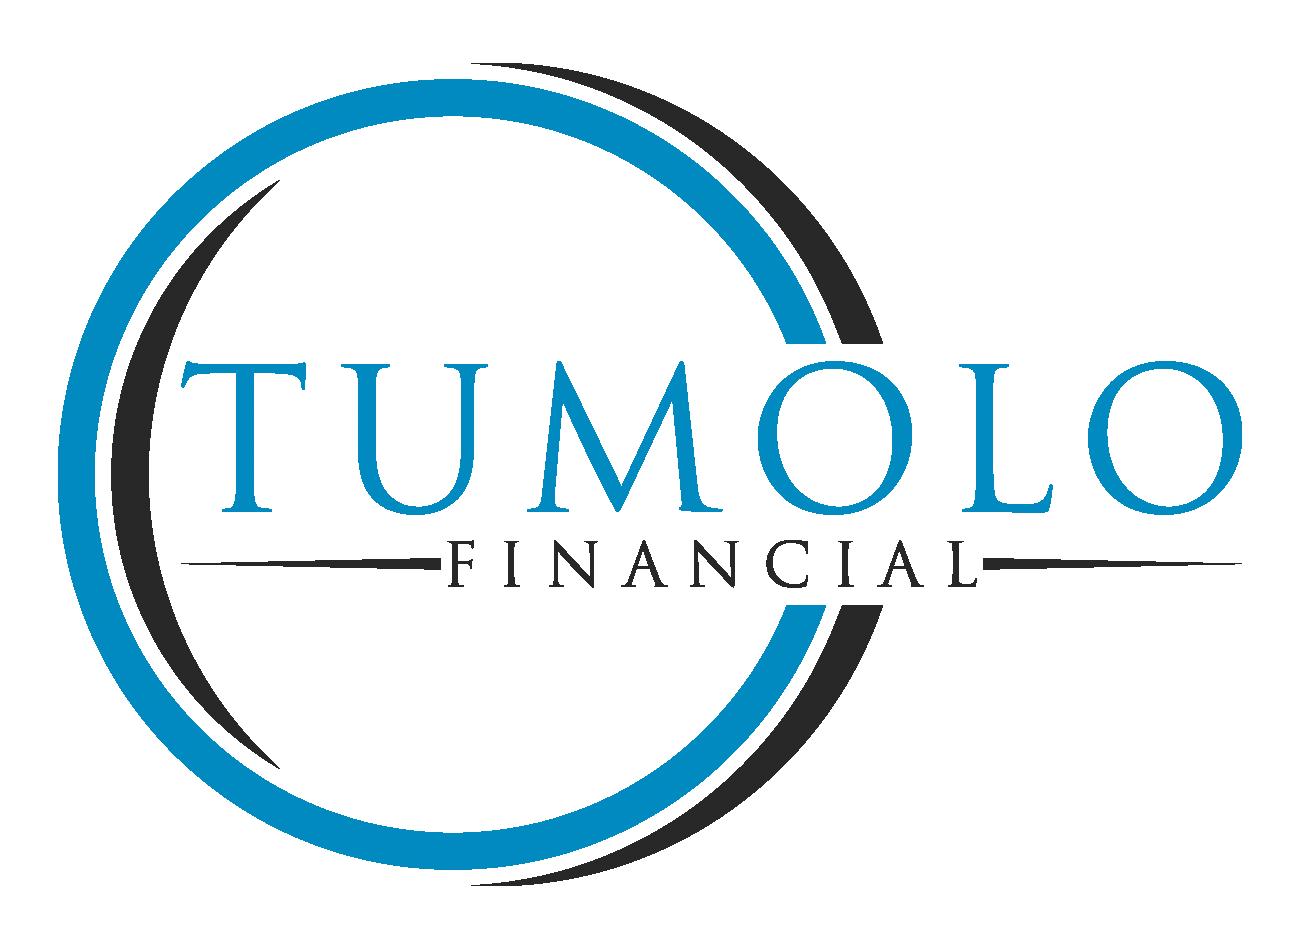 Ken Tumolo Financial